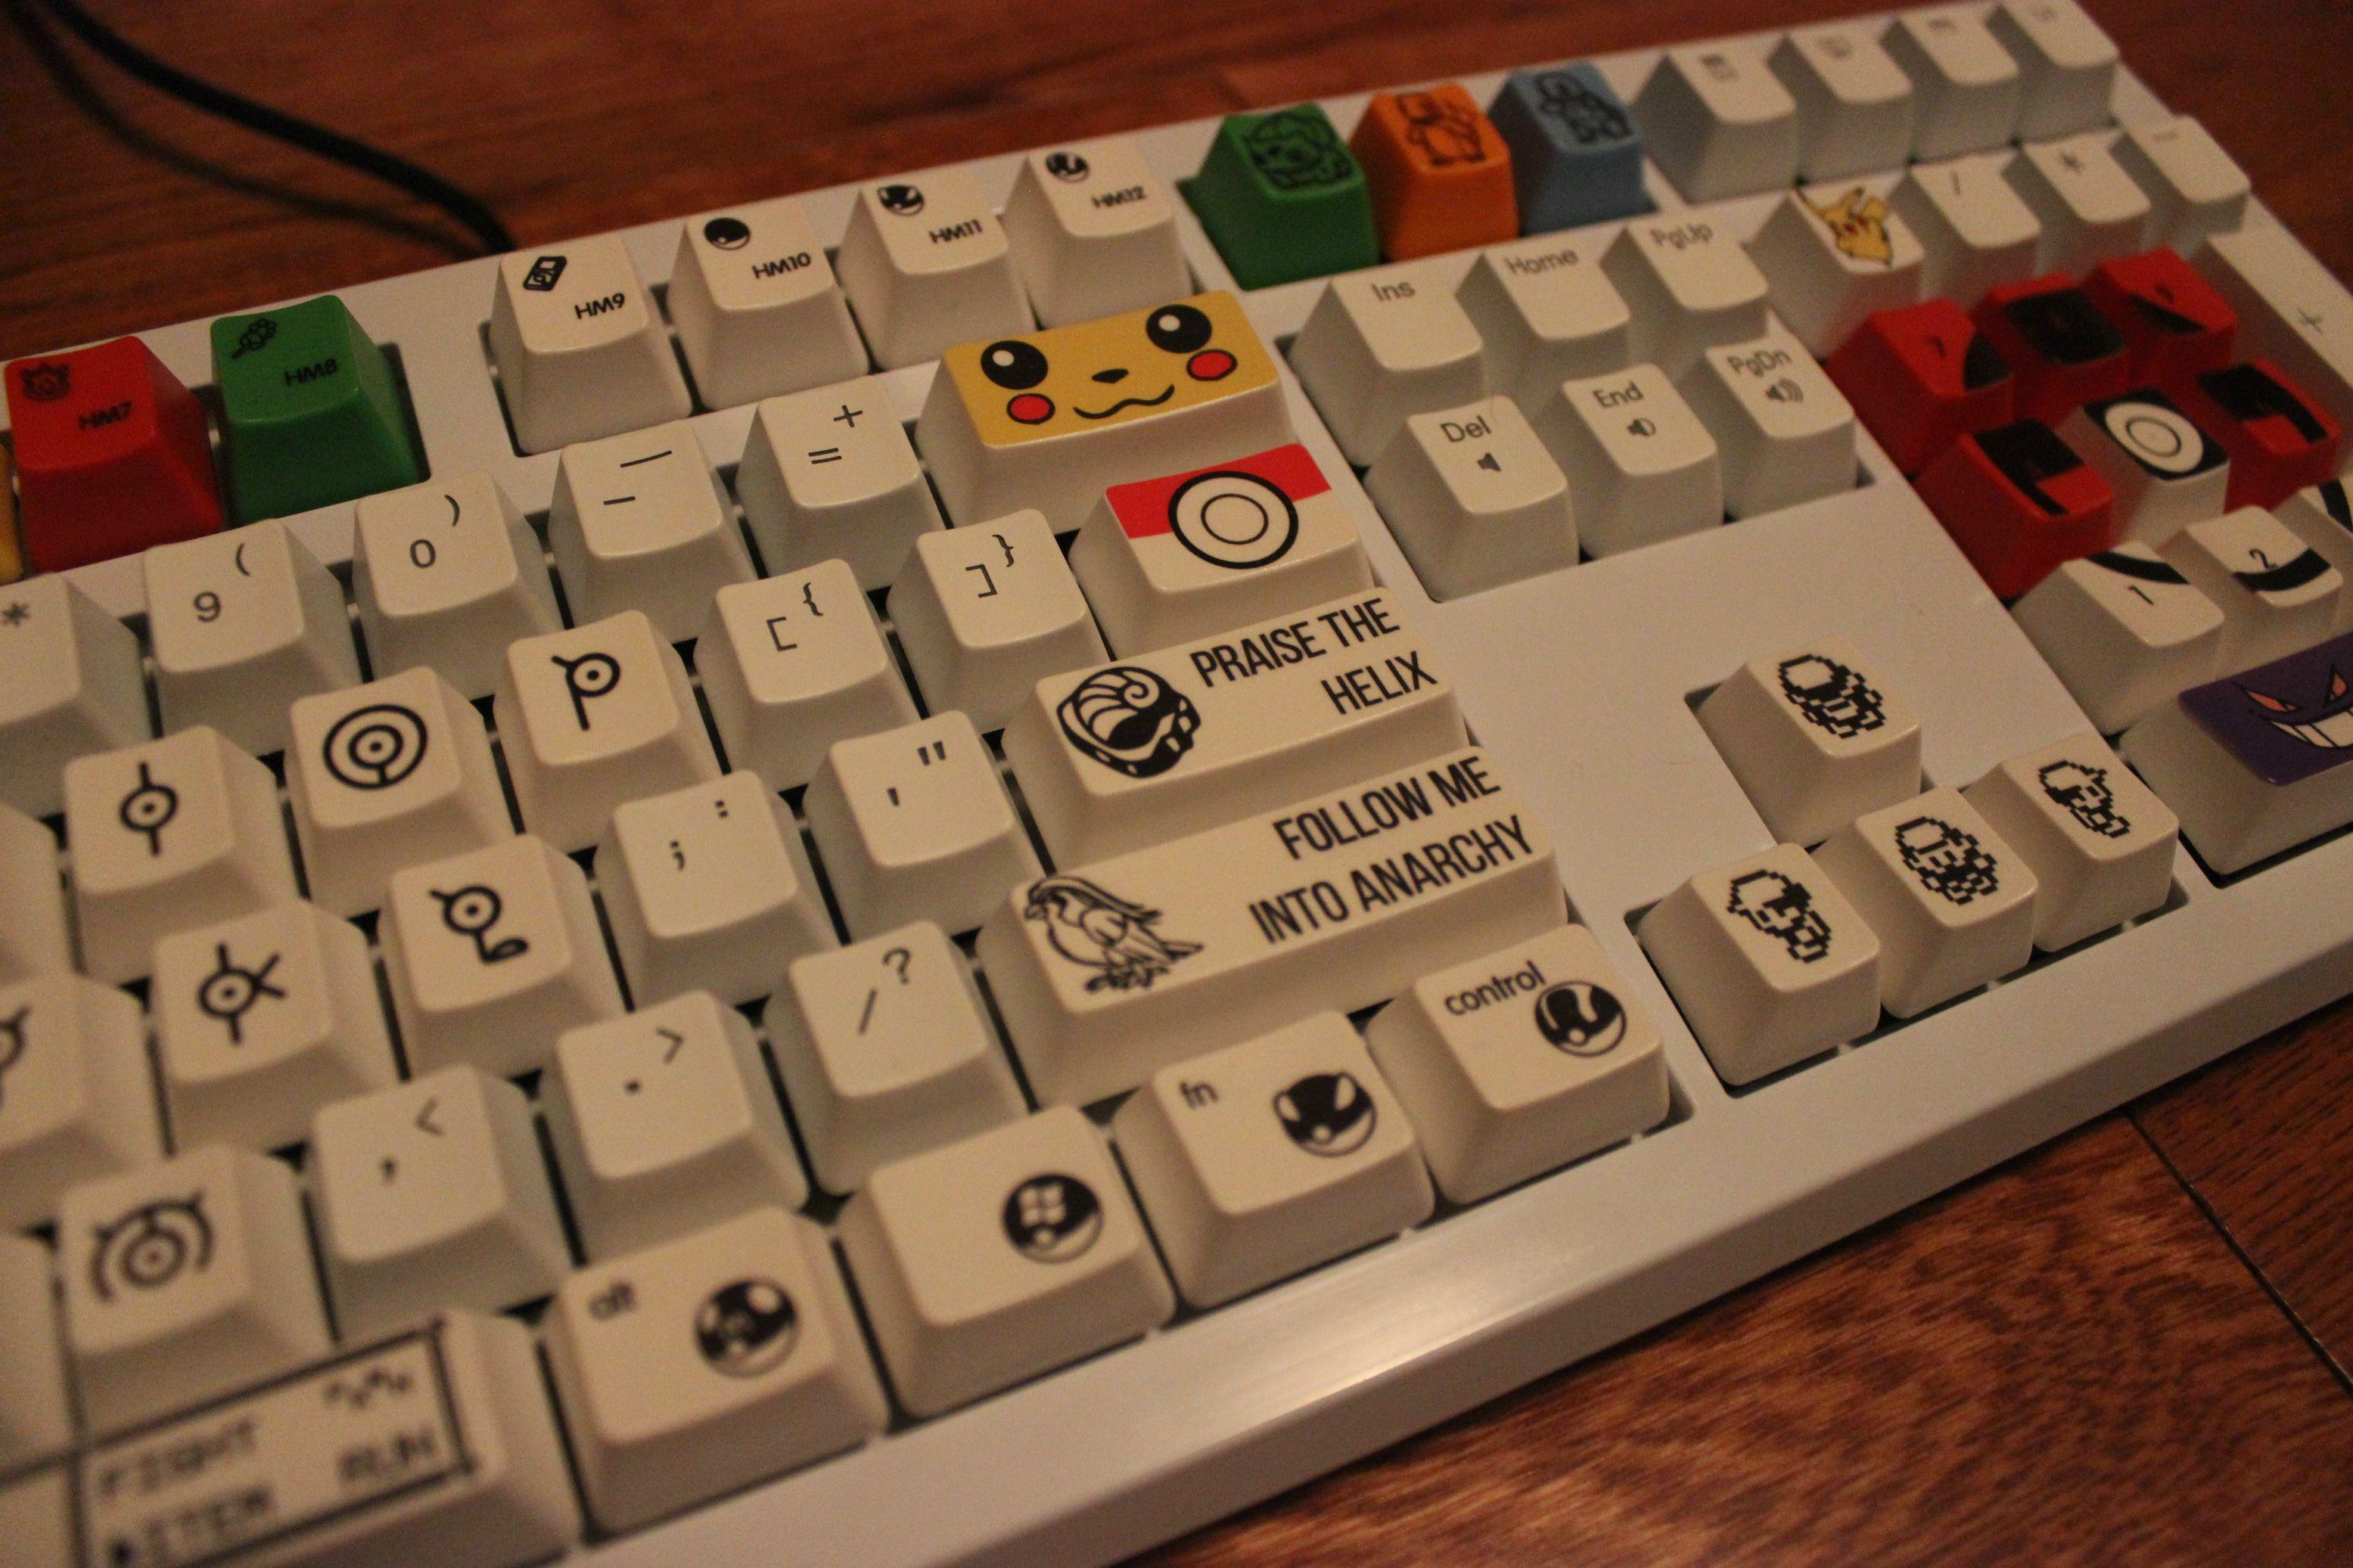 Custom Pokemon Mechanical Keyboard, by u/Str0ngmachine